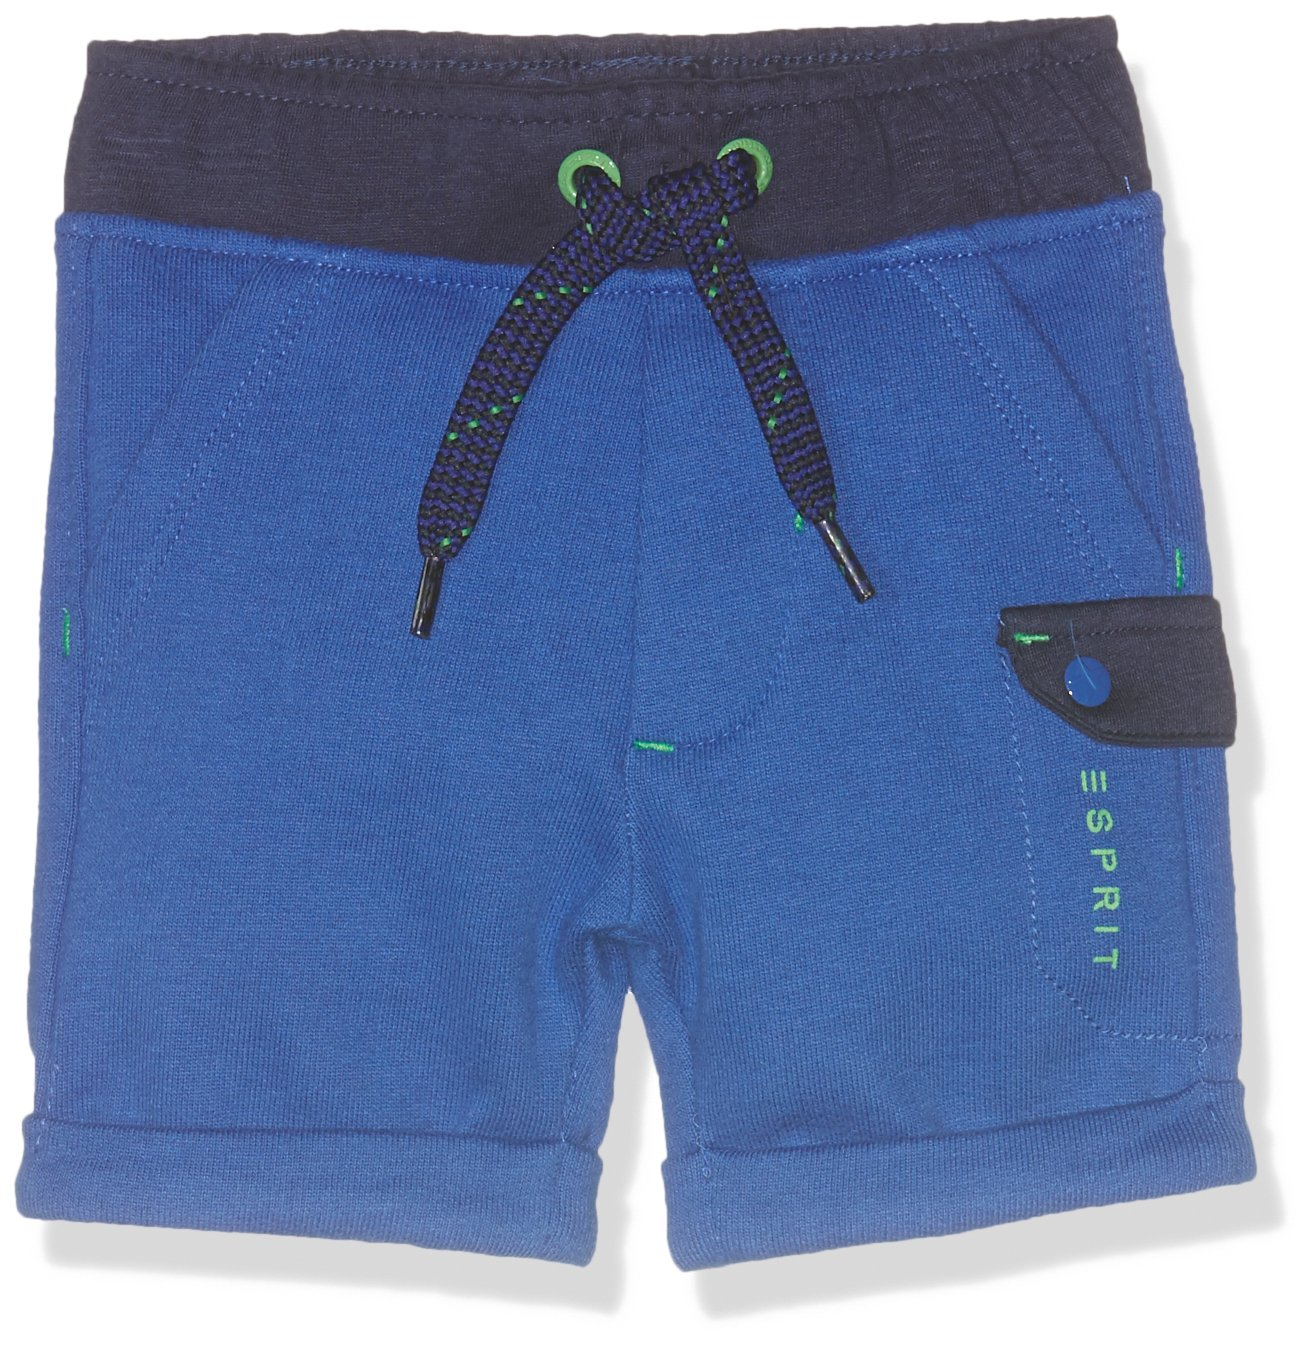 ESPRIT Kids Baby Boys' Bermuda Shorts RJ25002